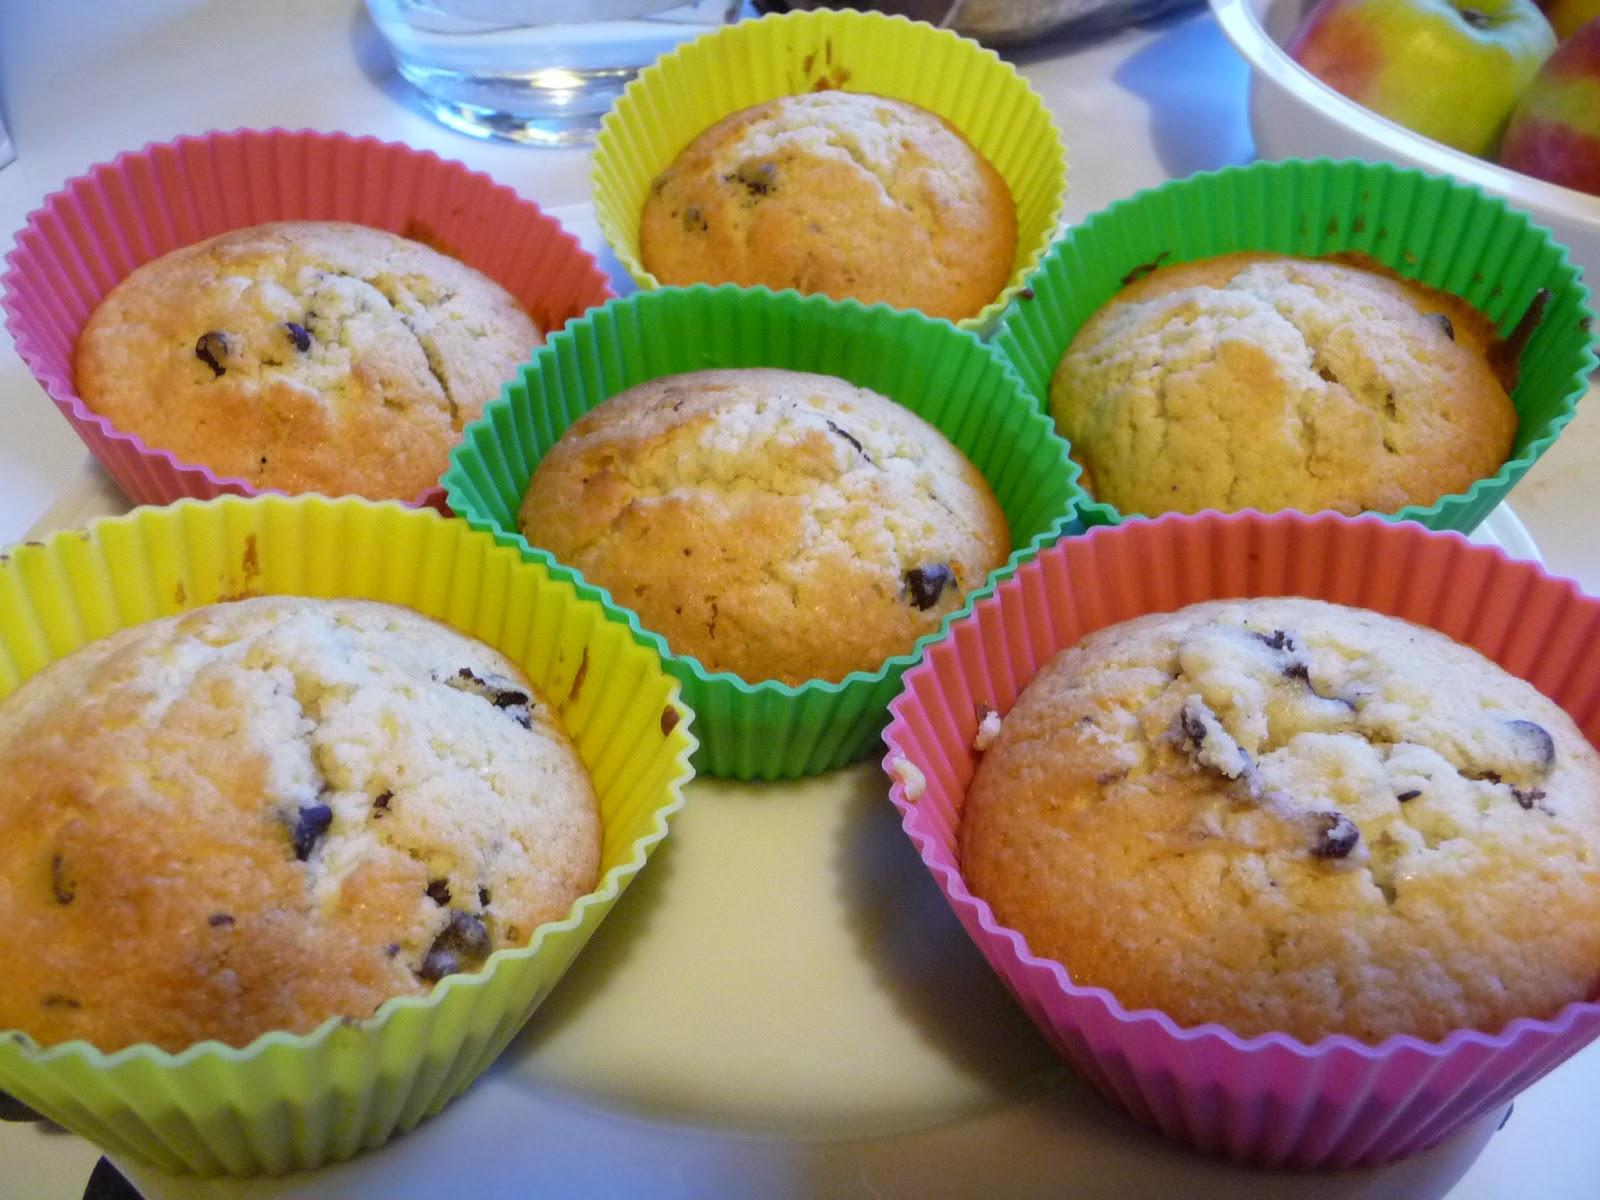 la rubrique  u00e0 brac  recette de muffin aux p u00e9pites de chocolat ultrafacile